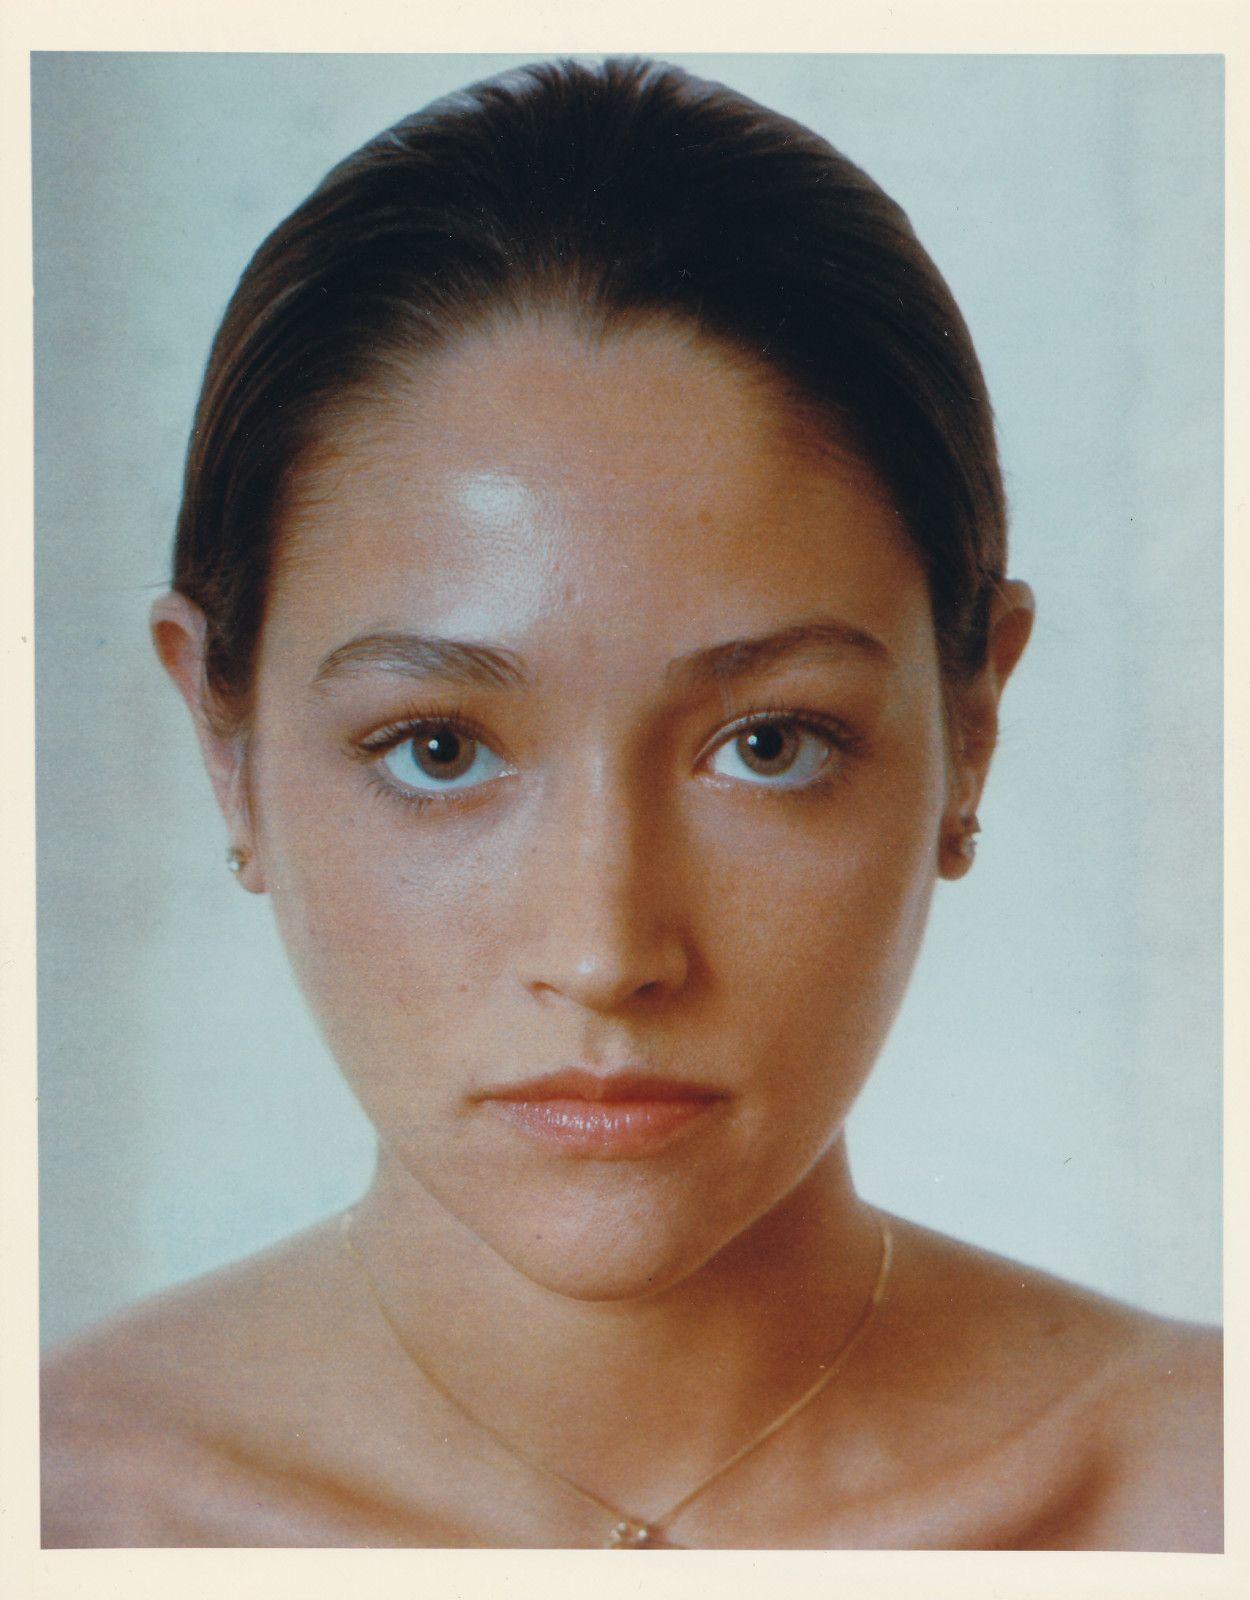 Olivia Hussey (born 1951)